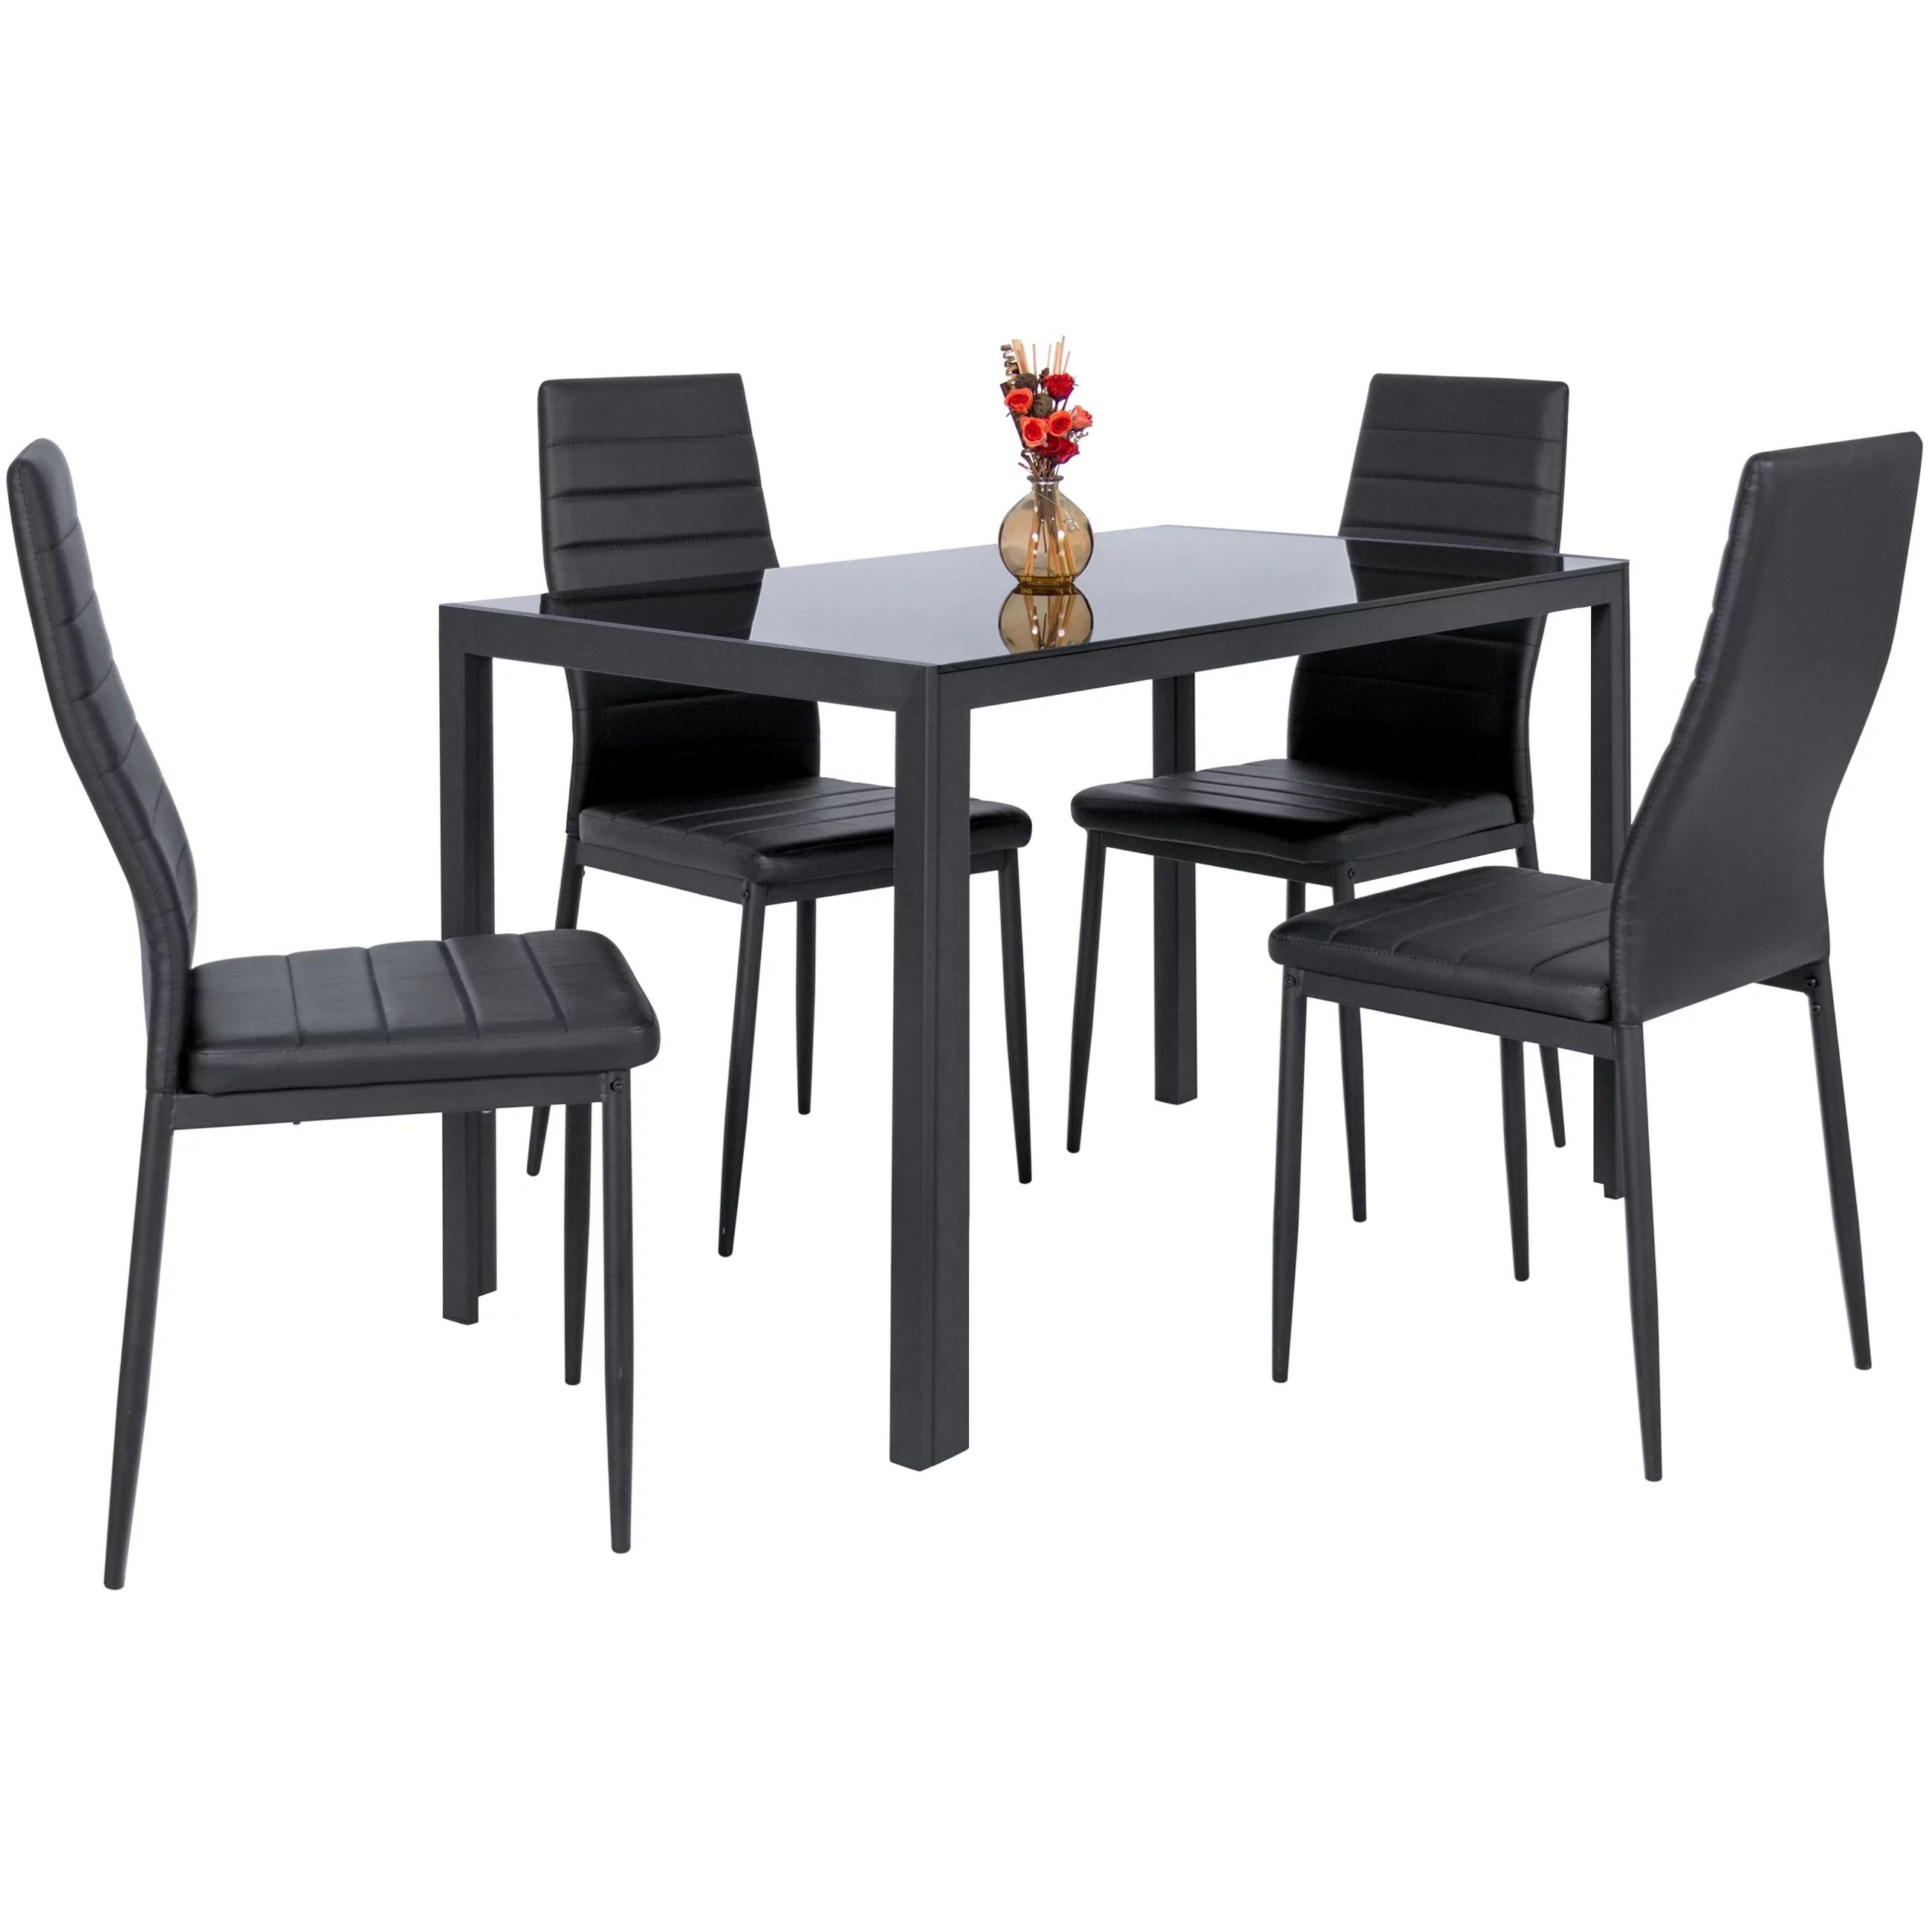 metal kitchen table sets black chairs zimtown modern dining set 4 chair glass room breakfast furniture walmart com